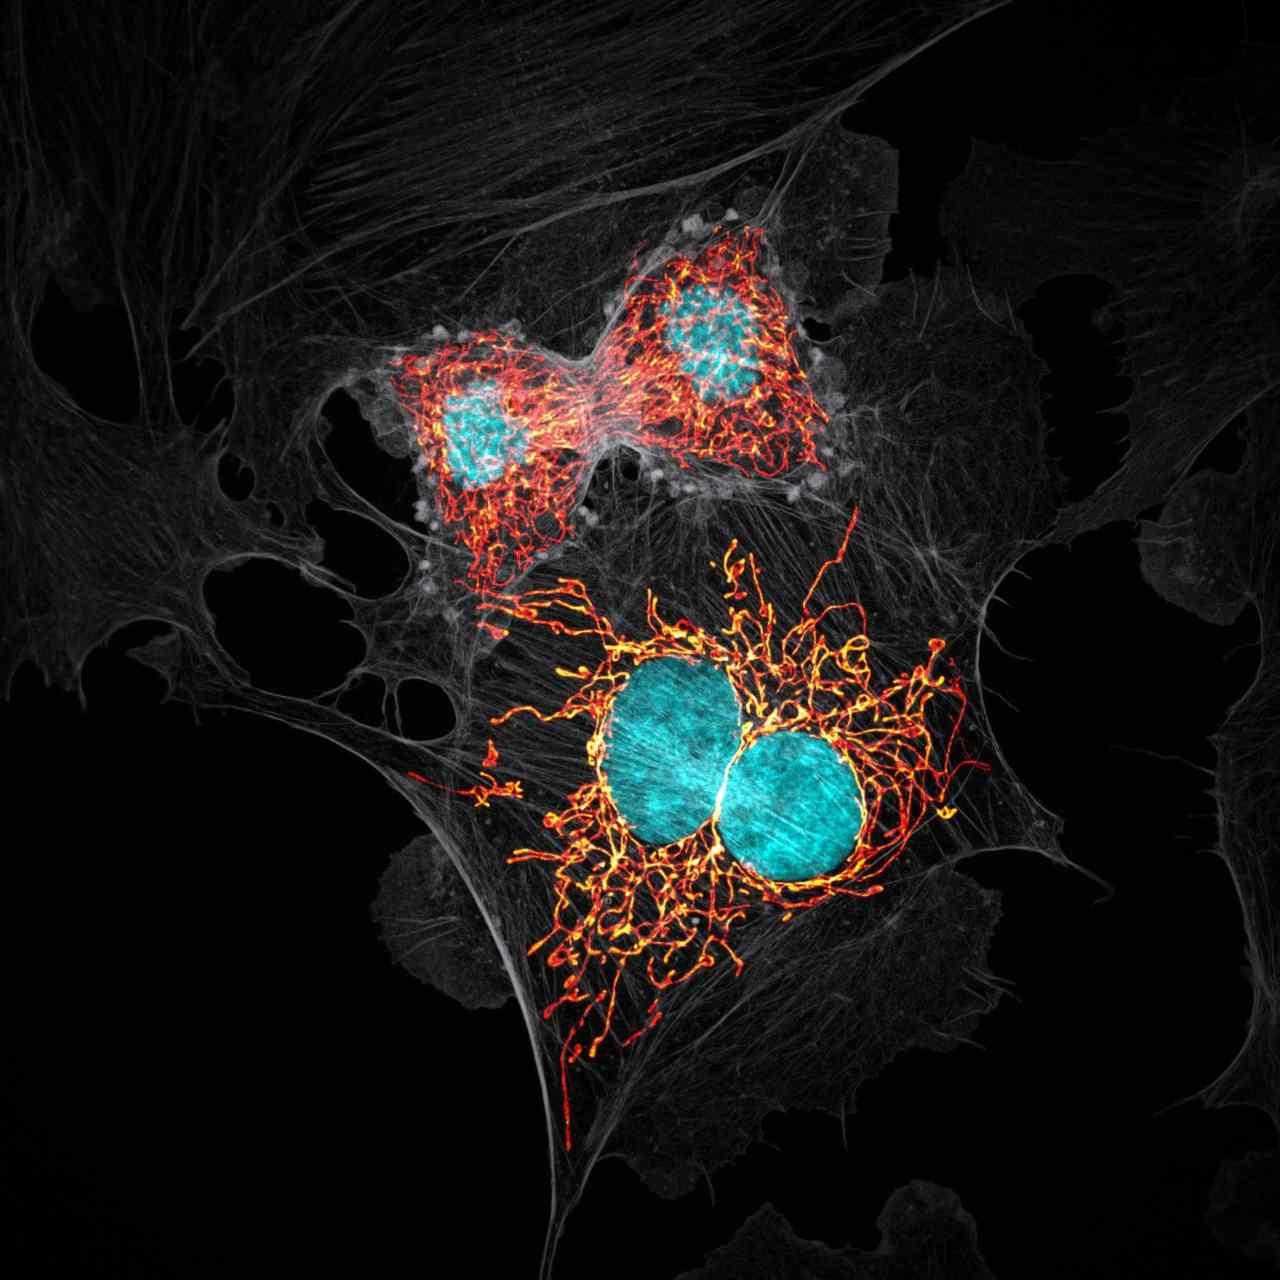 BPAE (Bovine Pulmonary Artery Endothelial) cells in telophase stage of mitosis. Image: Jason M Kirk/Nikon Small World